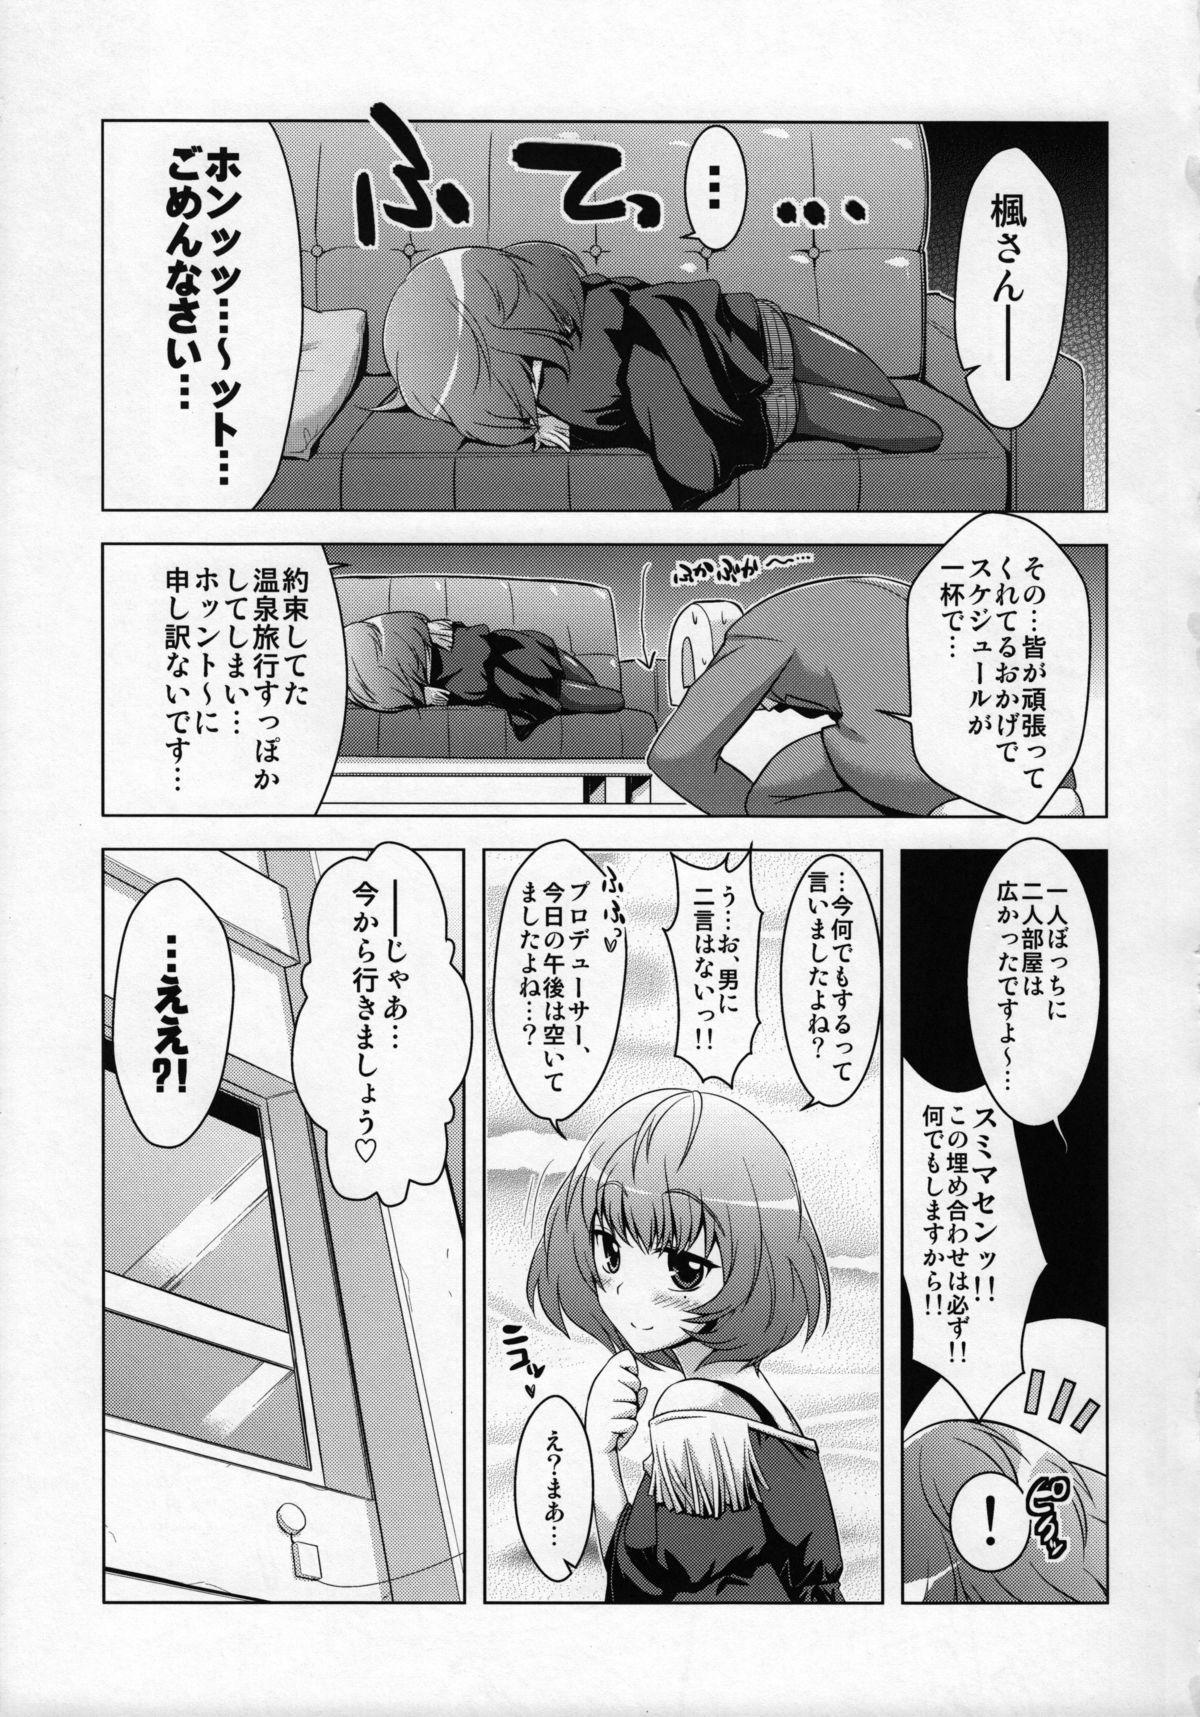 Kaede-san to Ofuro. 1